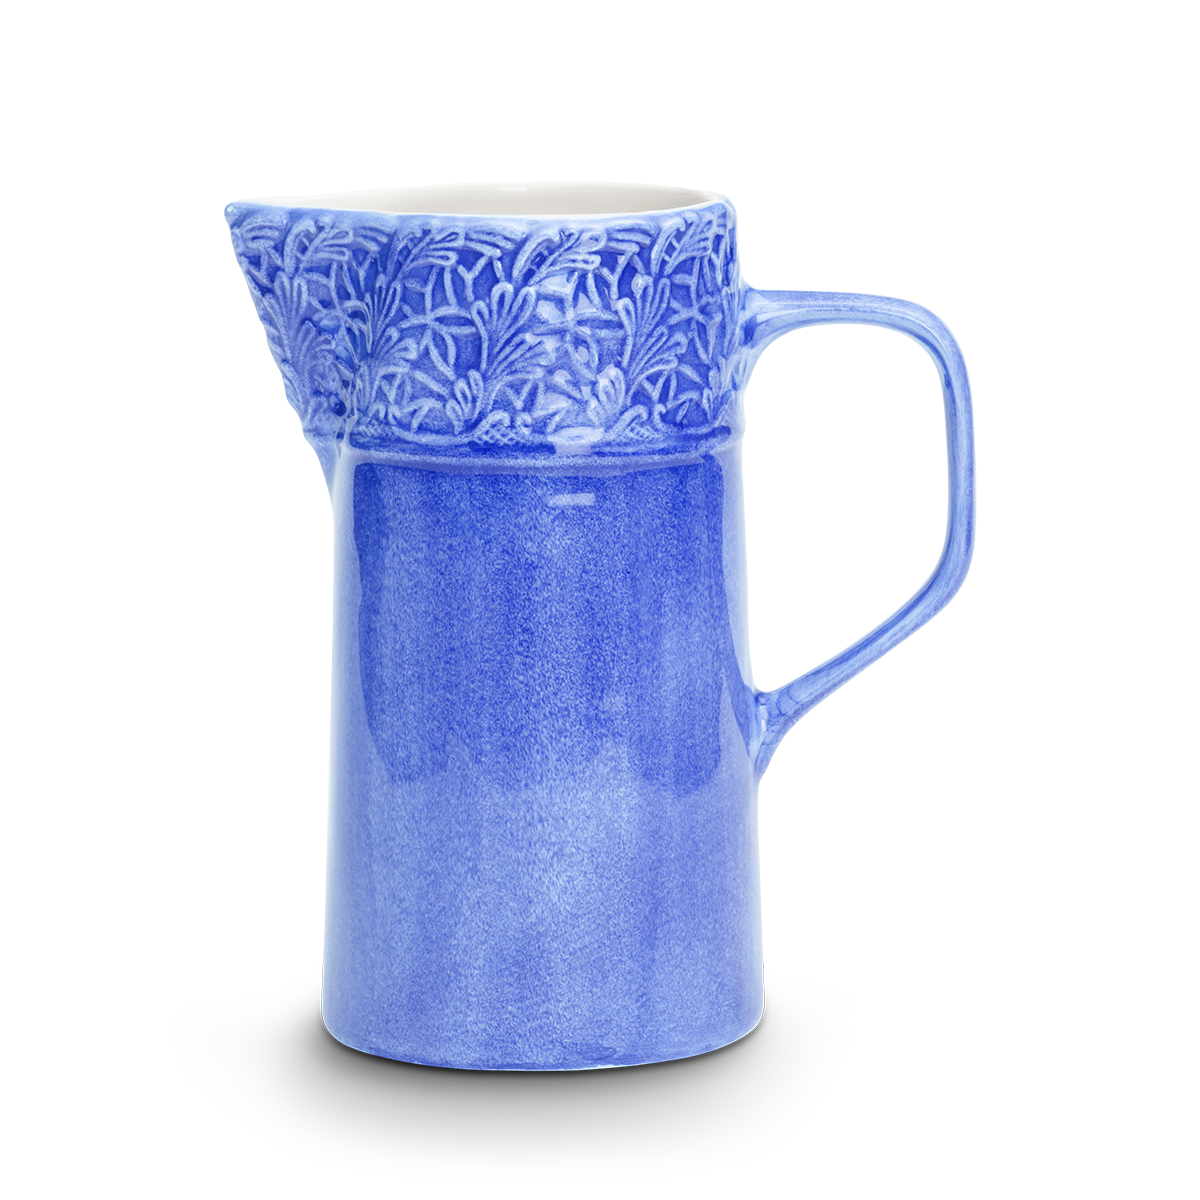 Spets Kanna Ljusblå 120 cl